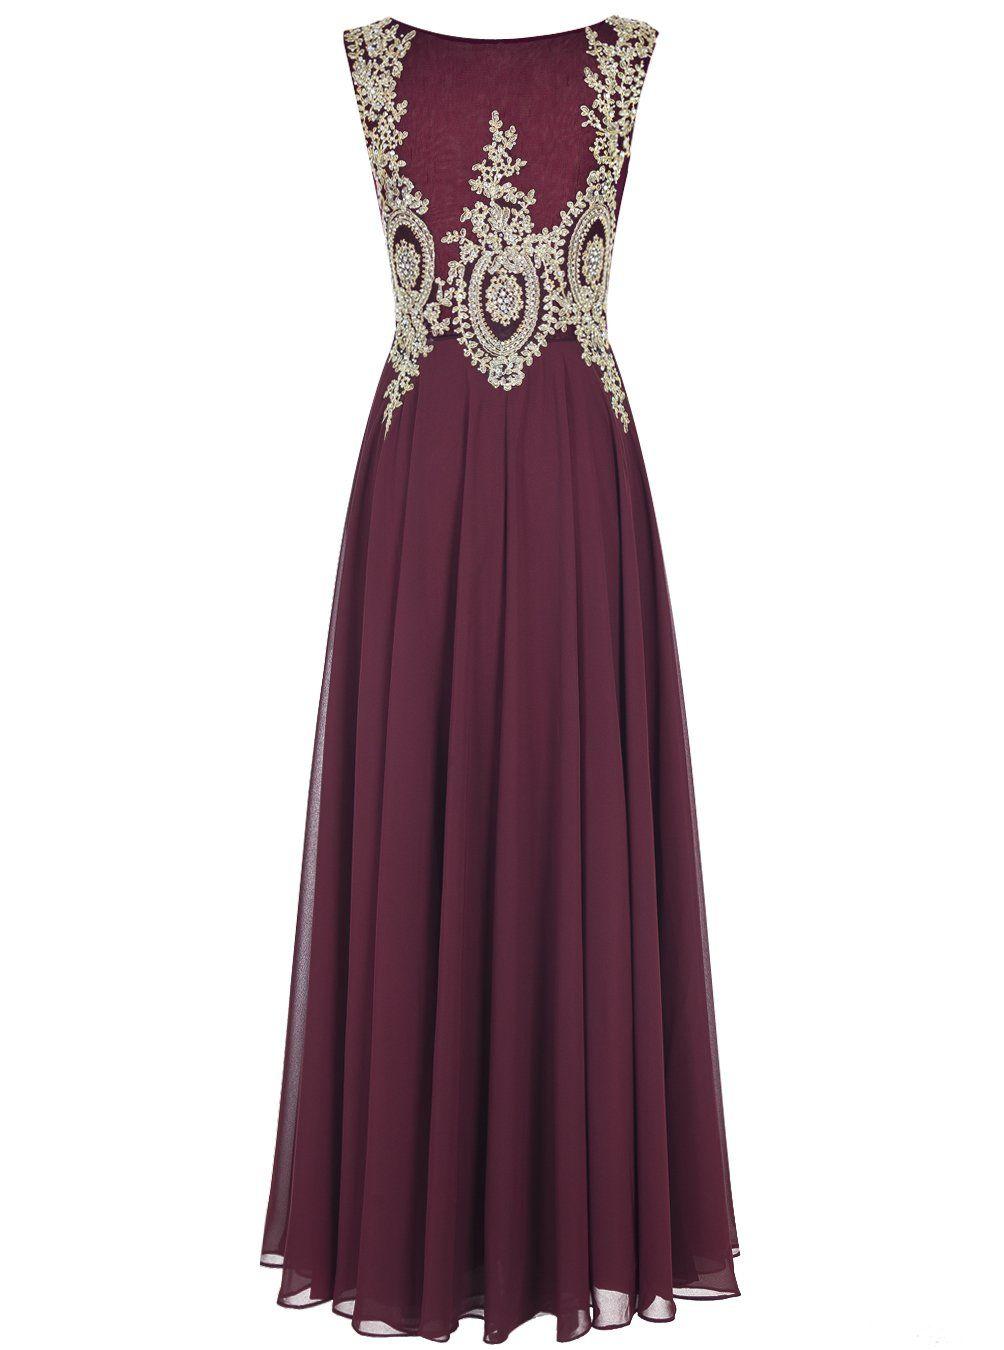 Alagirls long applique prom dress seethrough chiffon evening dress